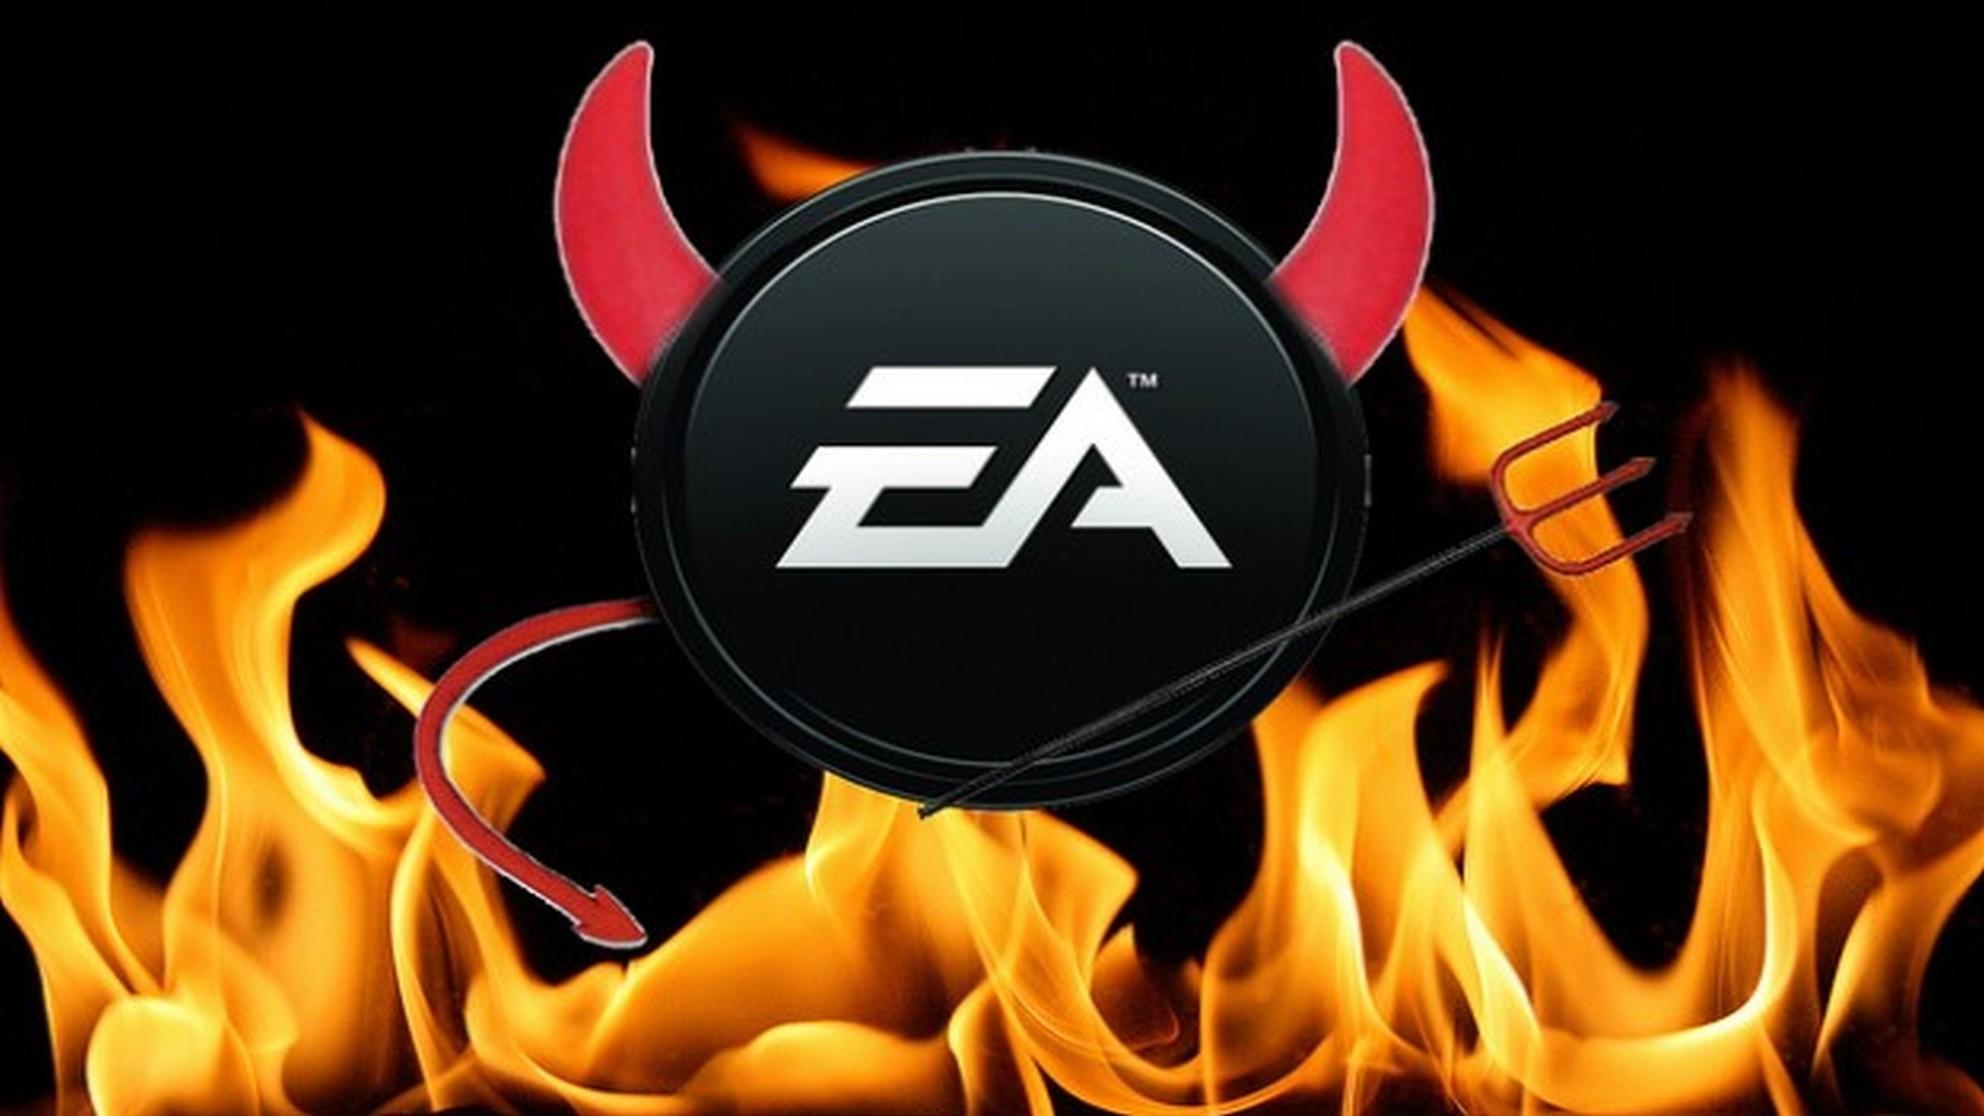 Brussel starts an investigation regarding EA loot boxes